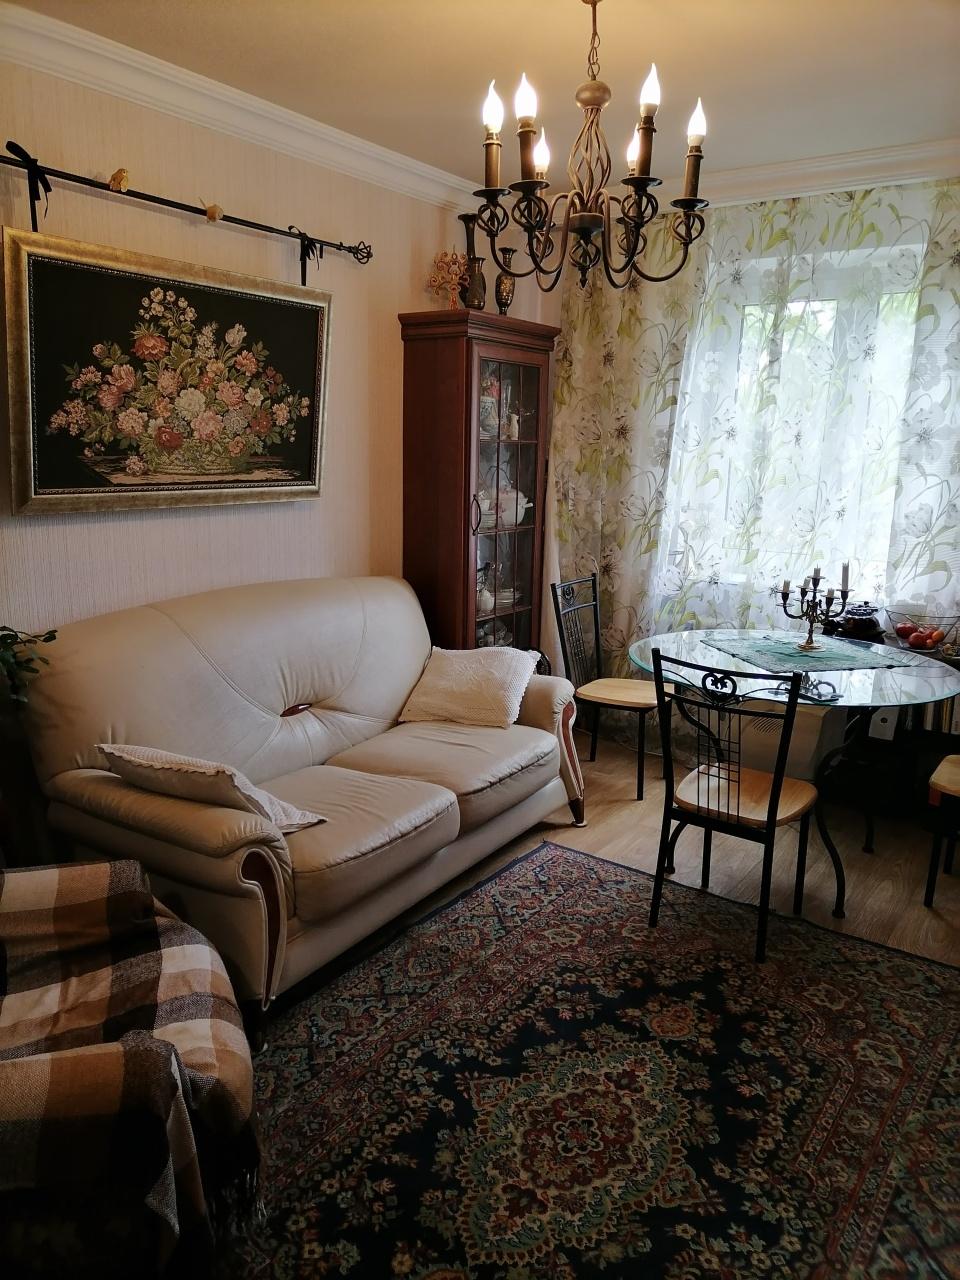 Продажа 3-комнатной квартиры Культуры ул., 8, Нижний Новгород